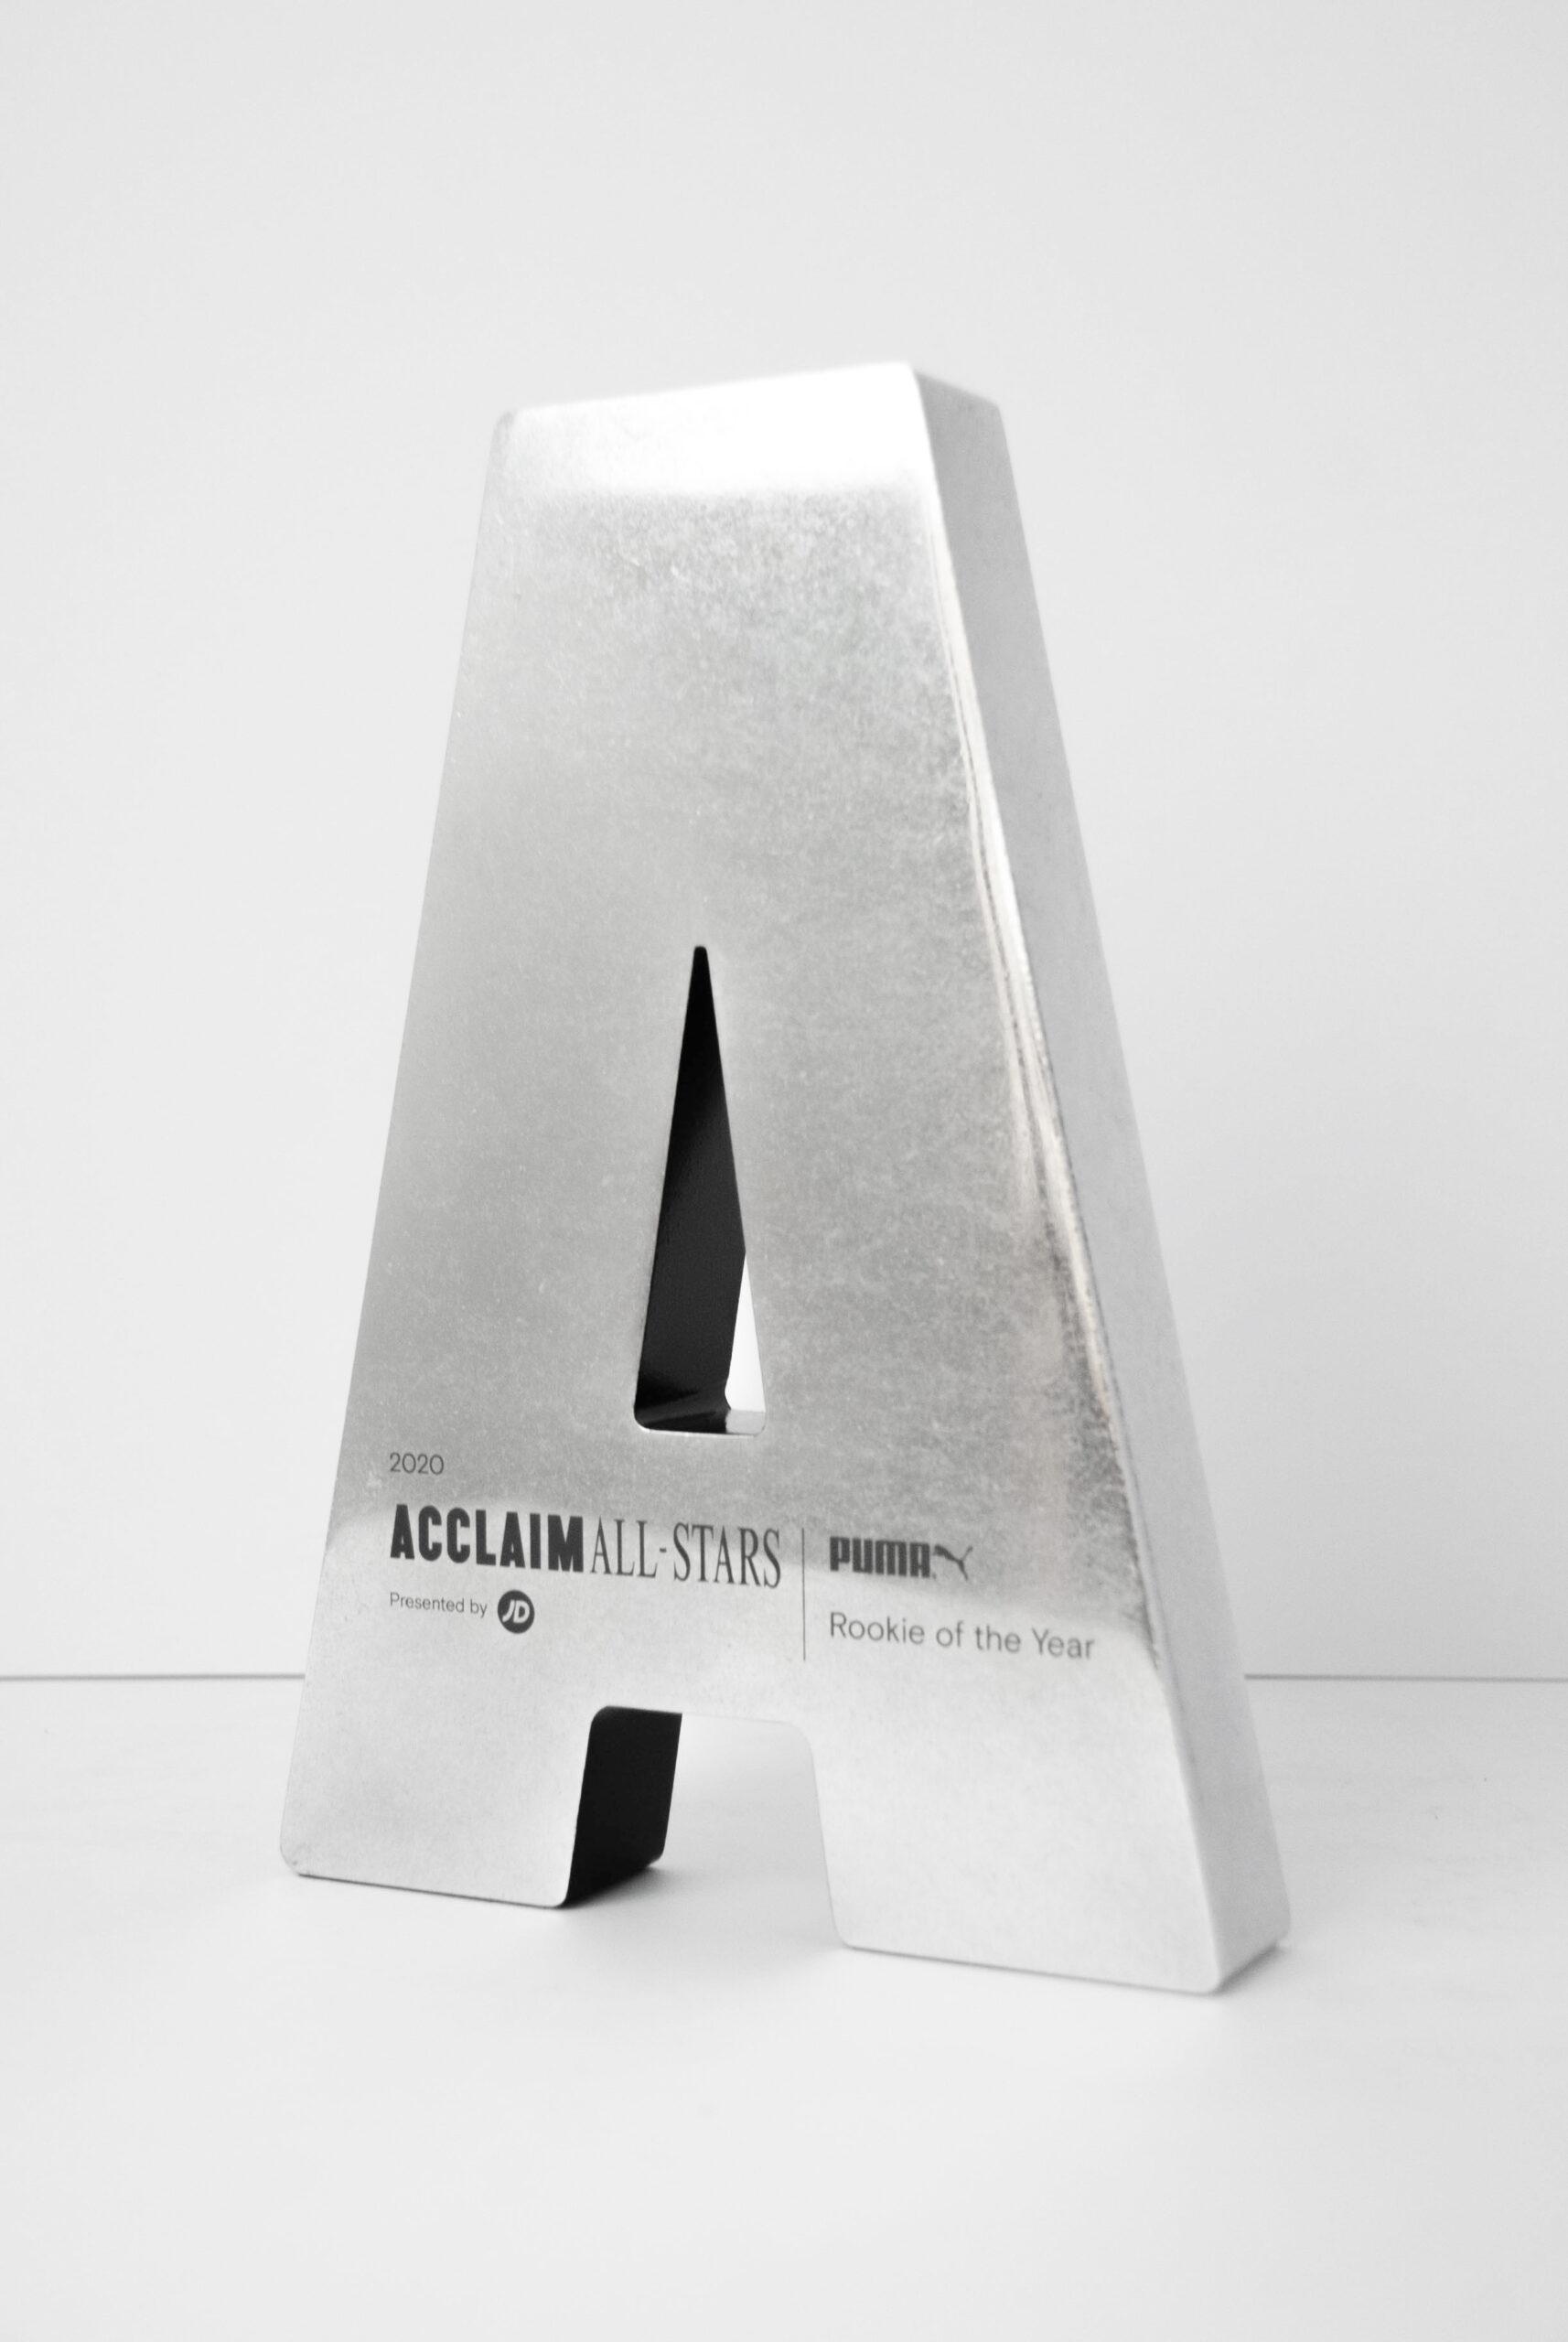 The Acclaim All Stars Bespoke Award Sydney